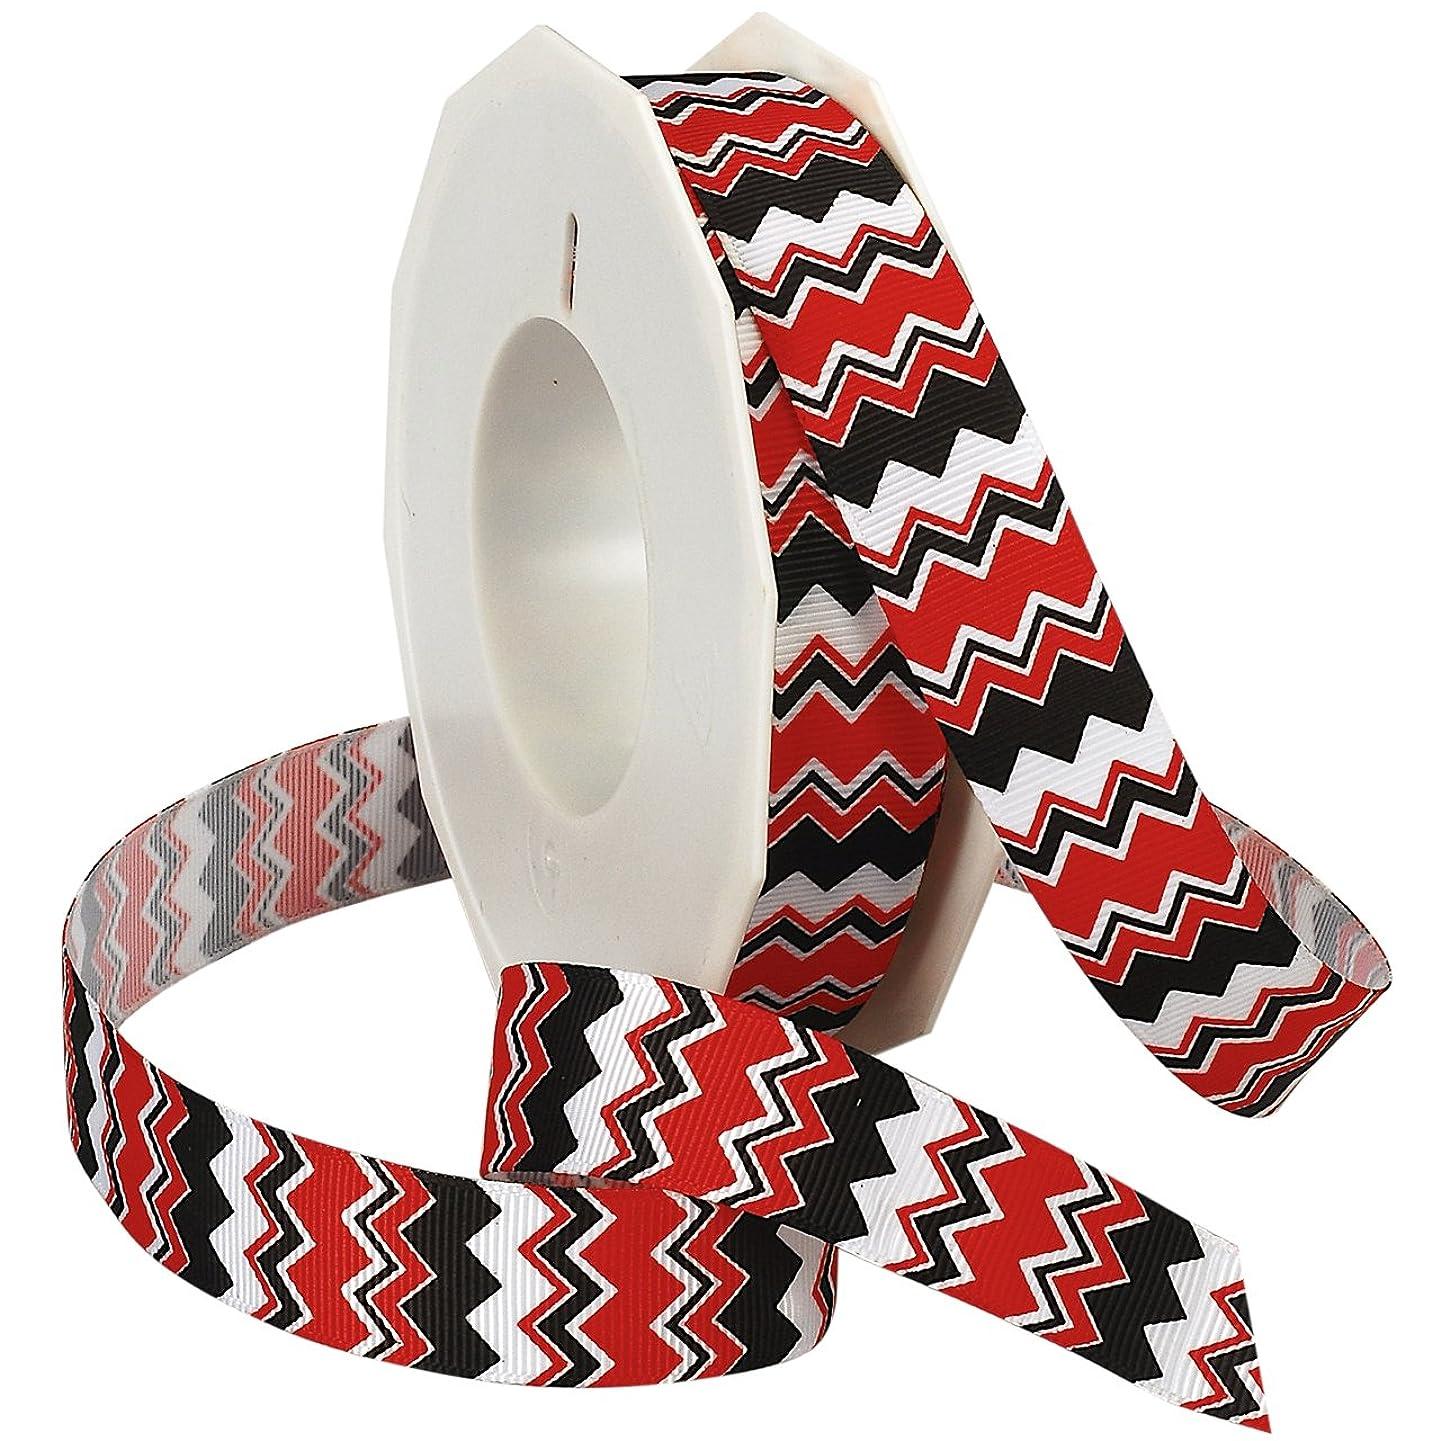 Morex Ribbon Chevron Printed Grosgrain Ribbon, 7/8-Inch by 20-Yard Spool, Red/Black